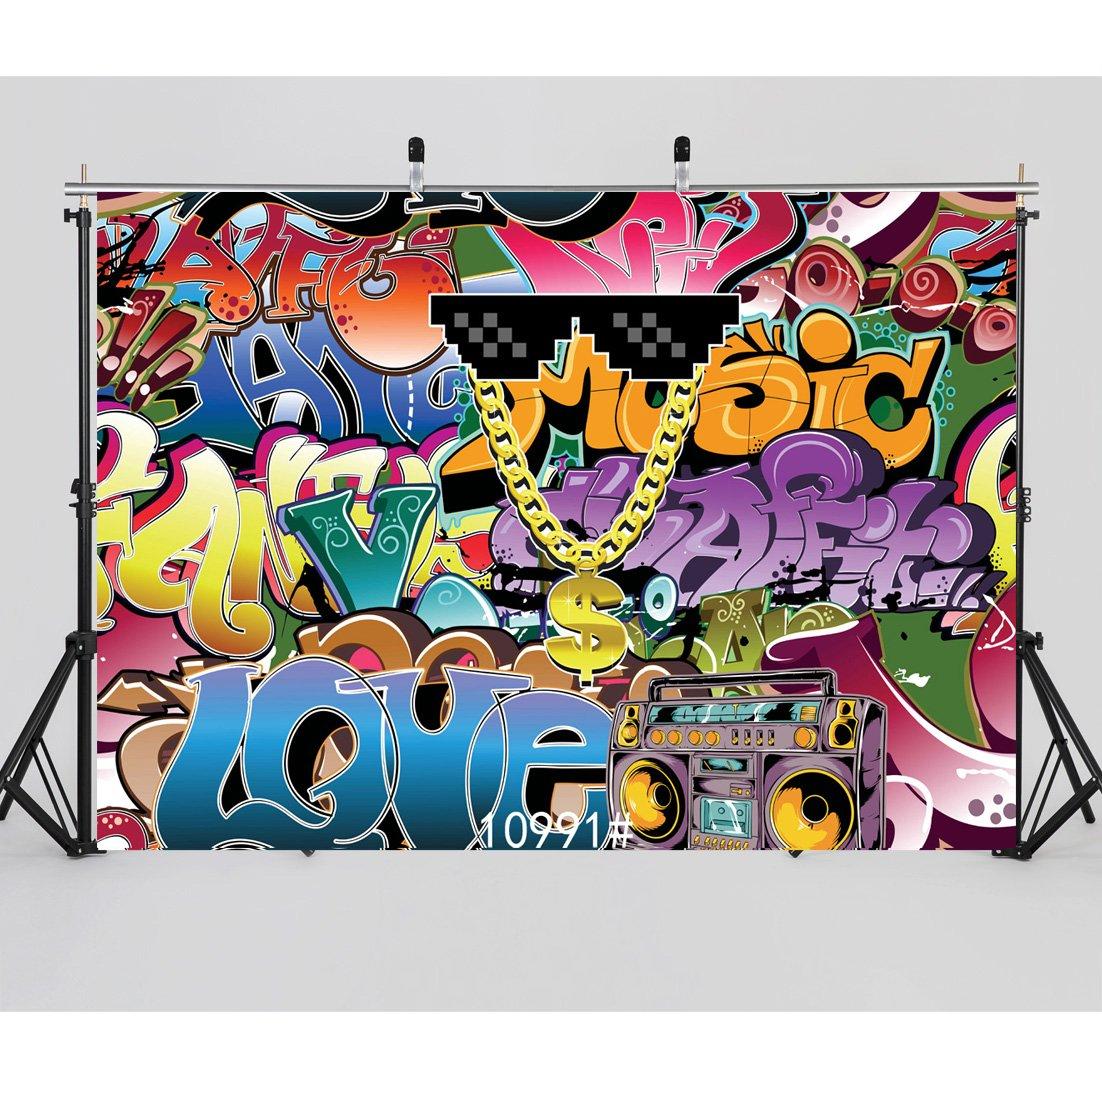 WOLADA 7x5ft Graphiti Photography Backdrops Vinyl Retro Style 90's Party Decoration Photo Booth Studio Props 10991